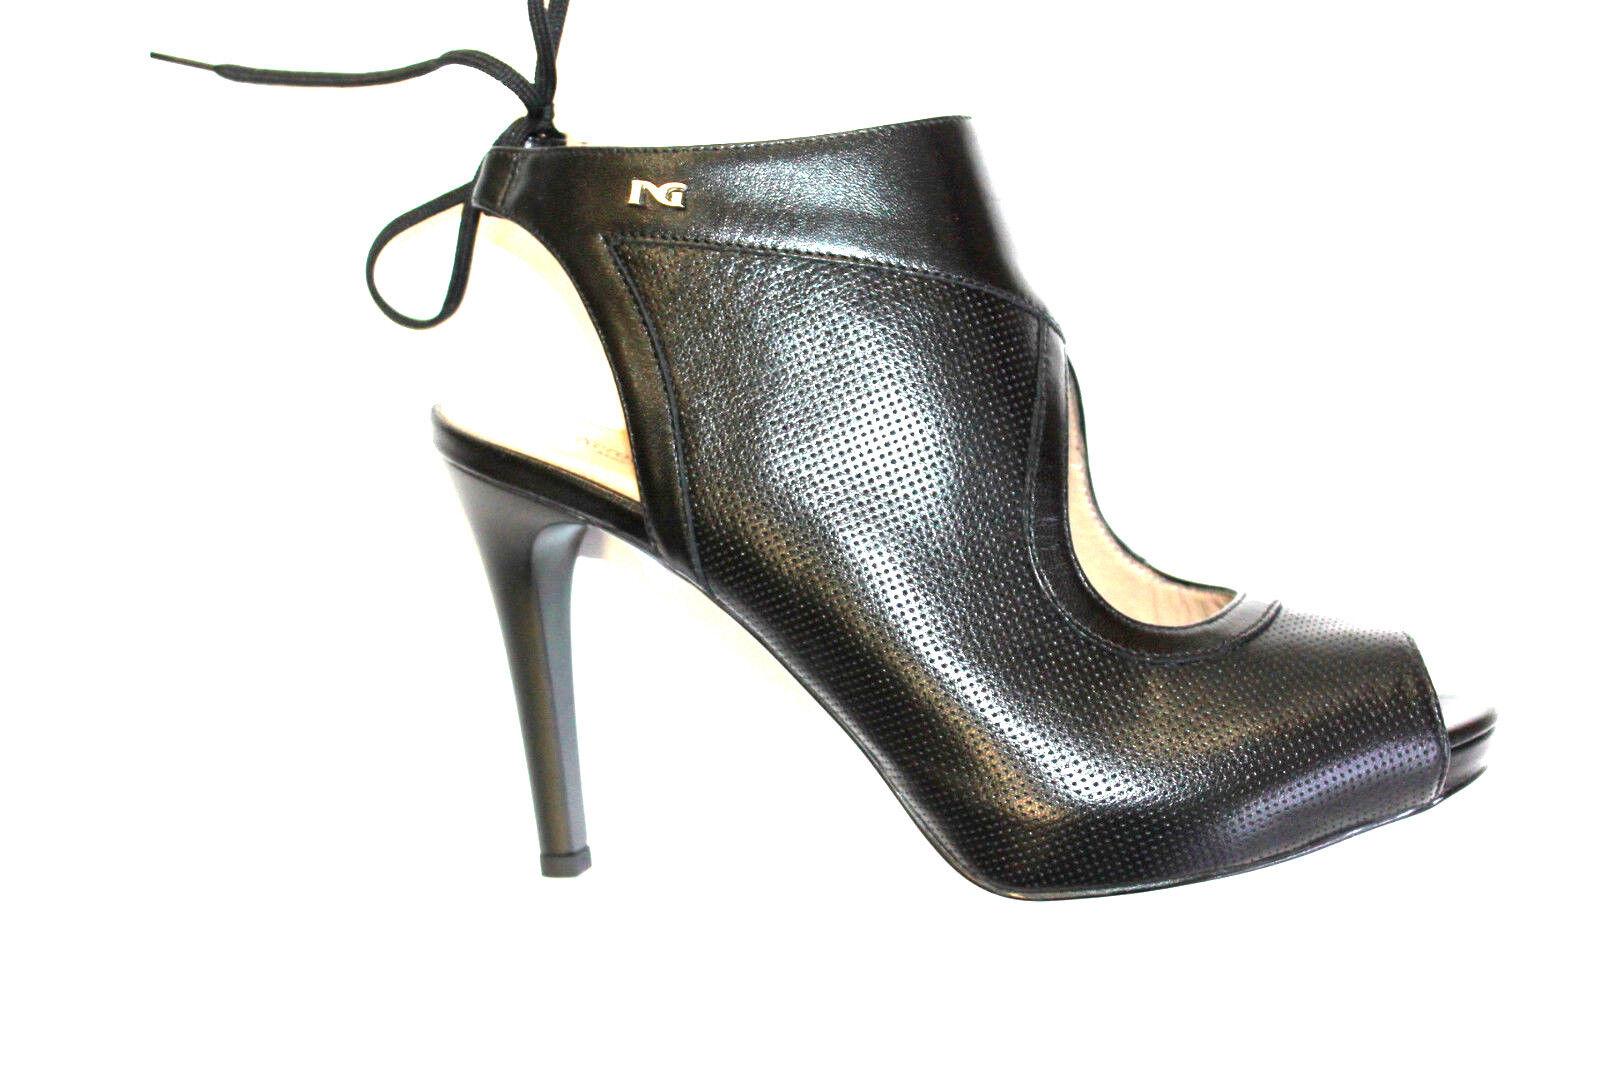 Sandalo elegante negro giardini 805440 100 legata accollata platò interno